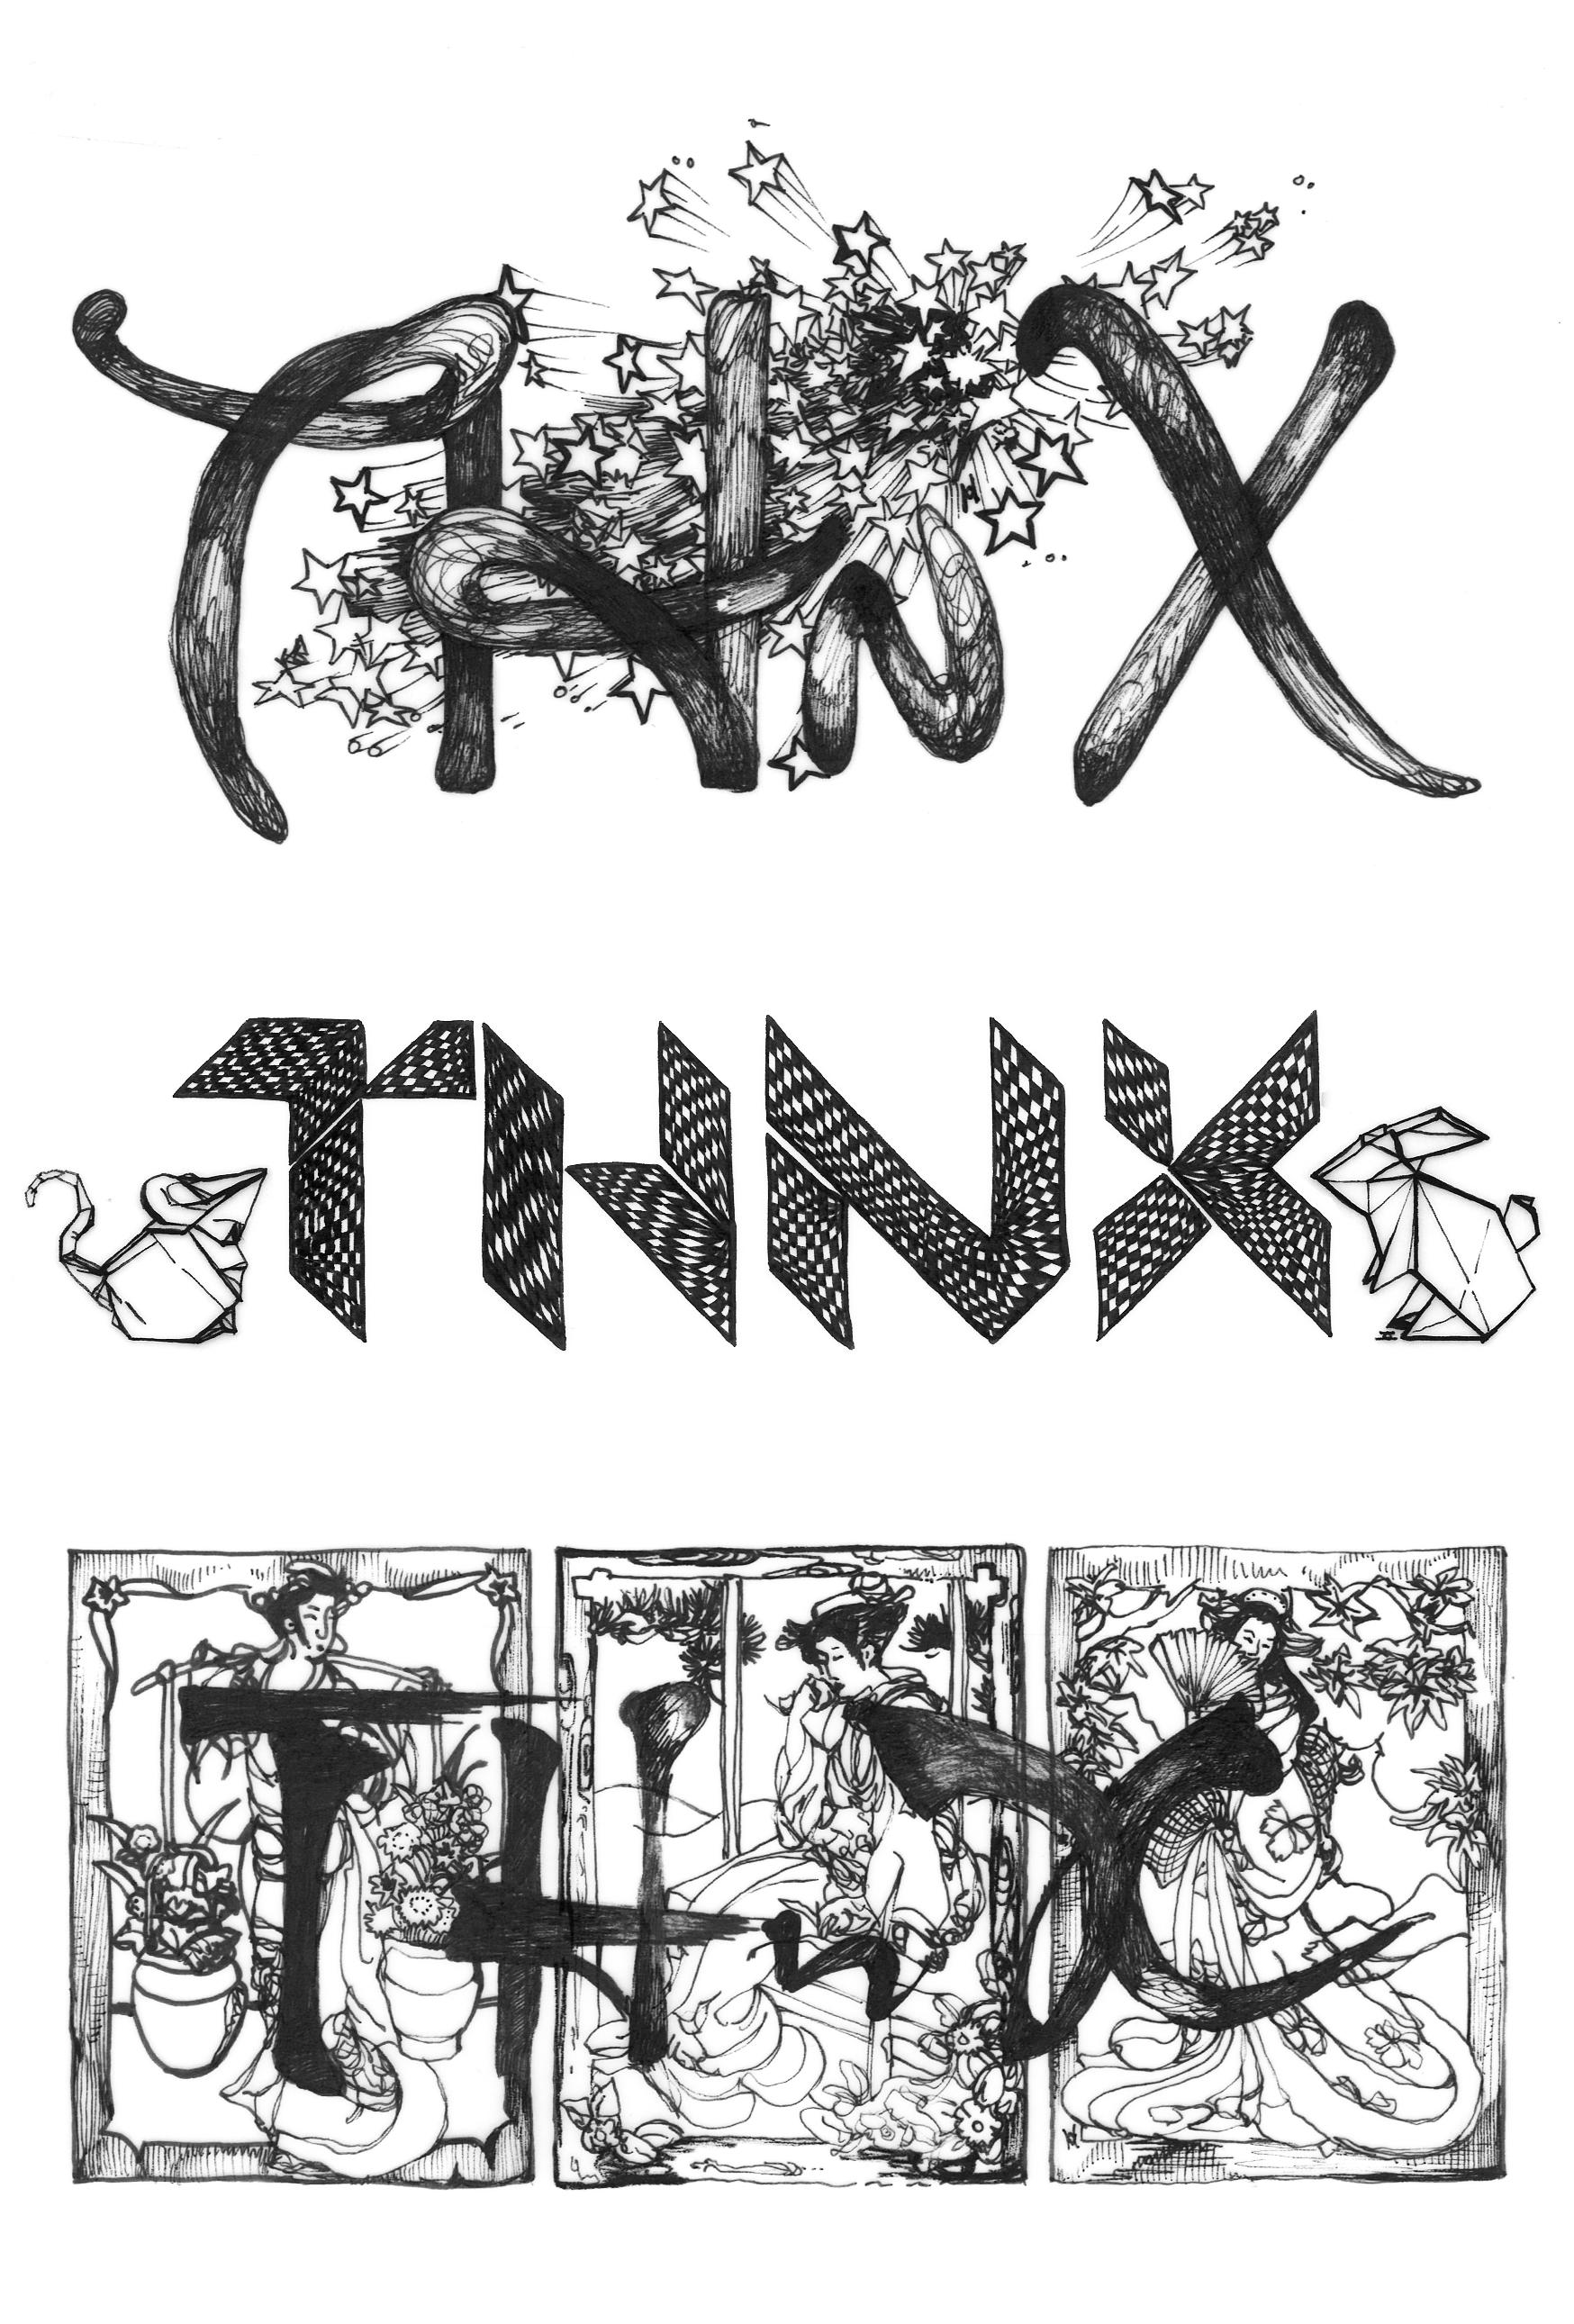 'Thanx'